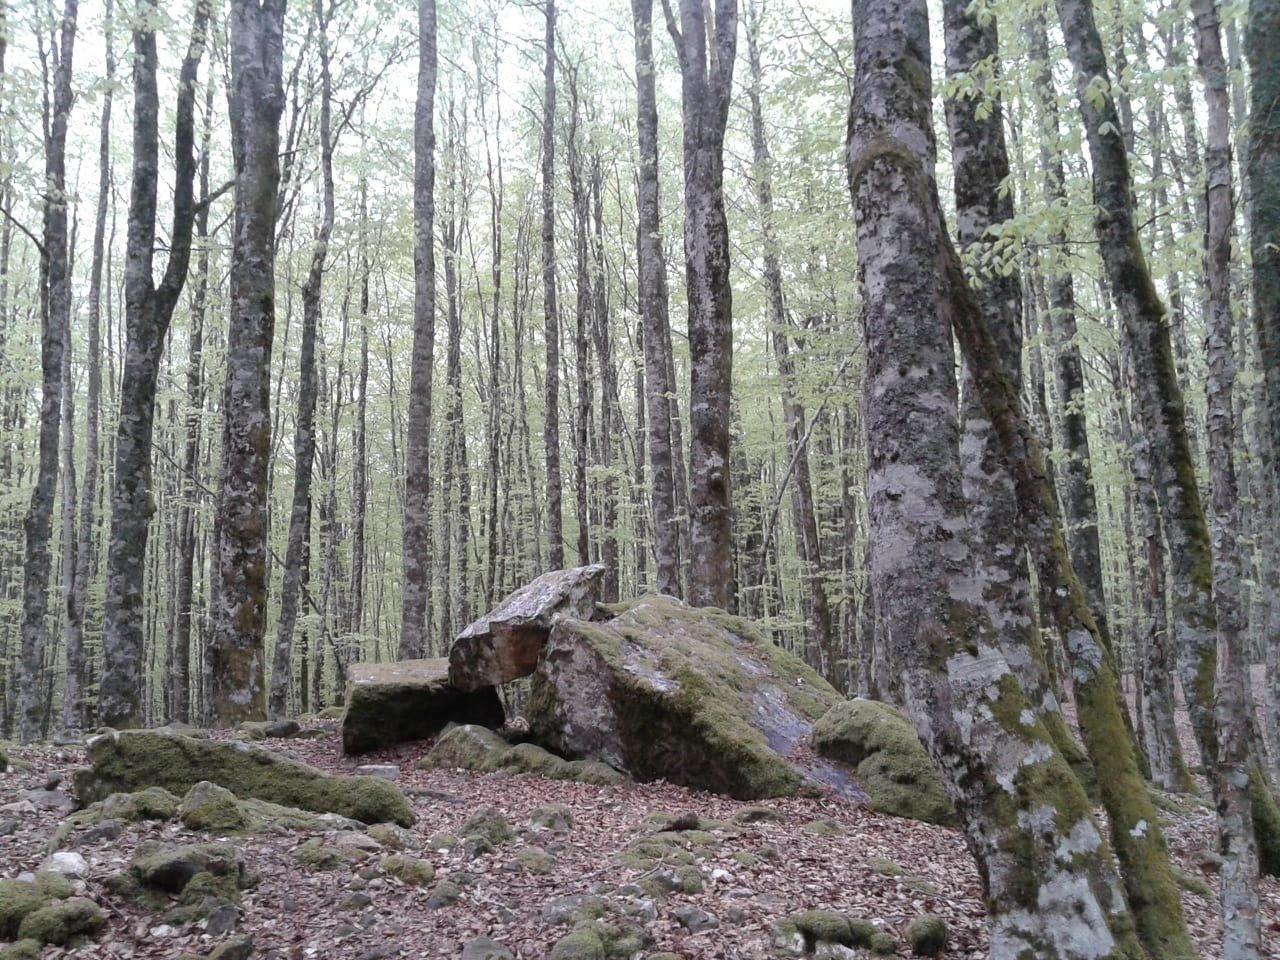 Diario de un peregrino: Burguete-Roncesvalles, 2 de mayo